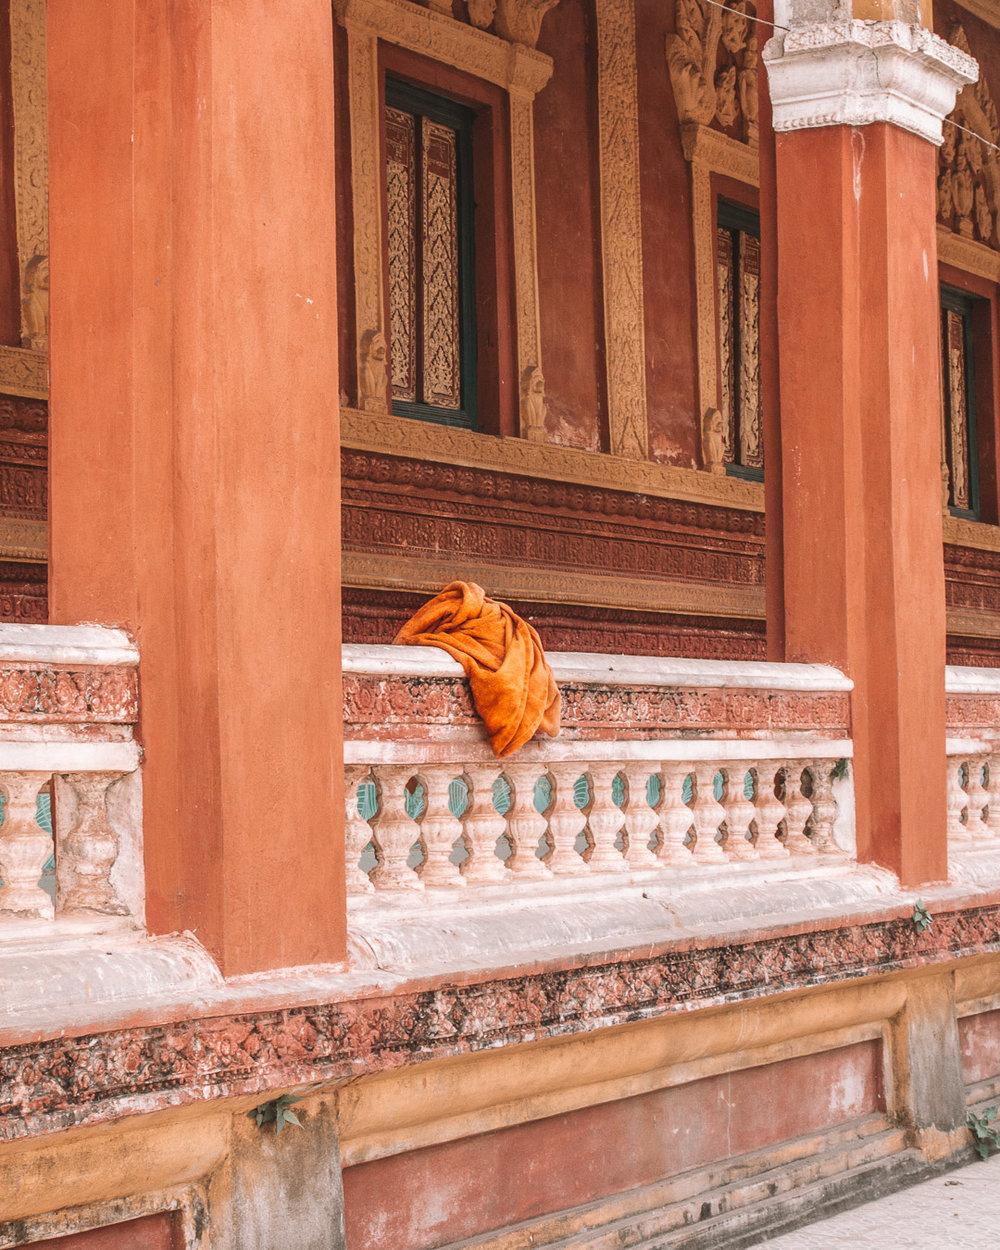 buddhist temple orange photography beautiful traditional culture religion